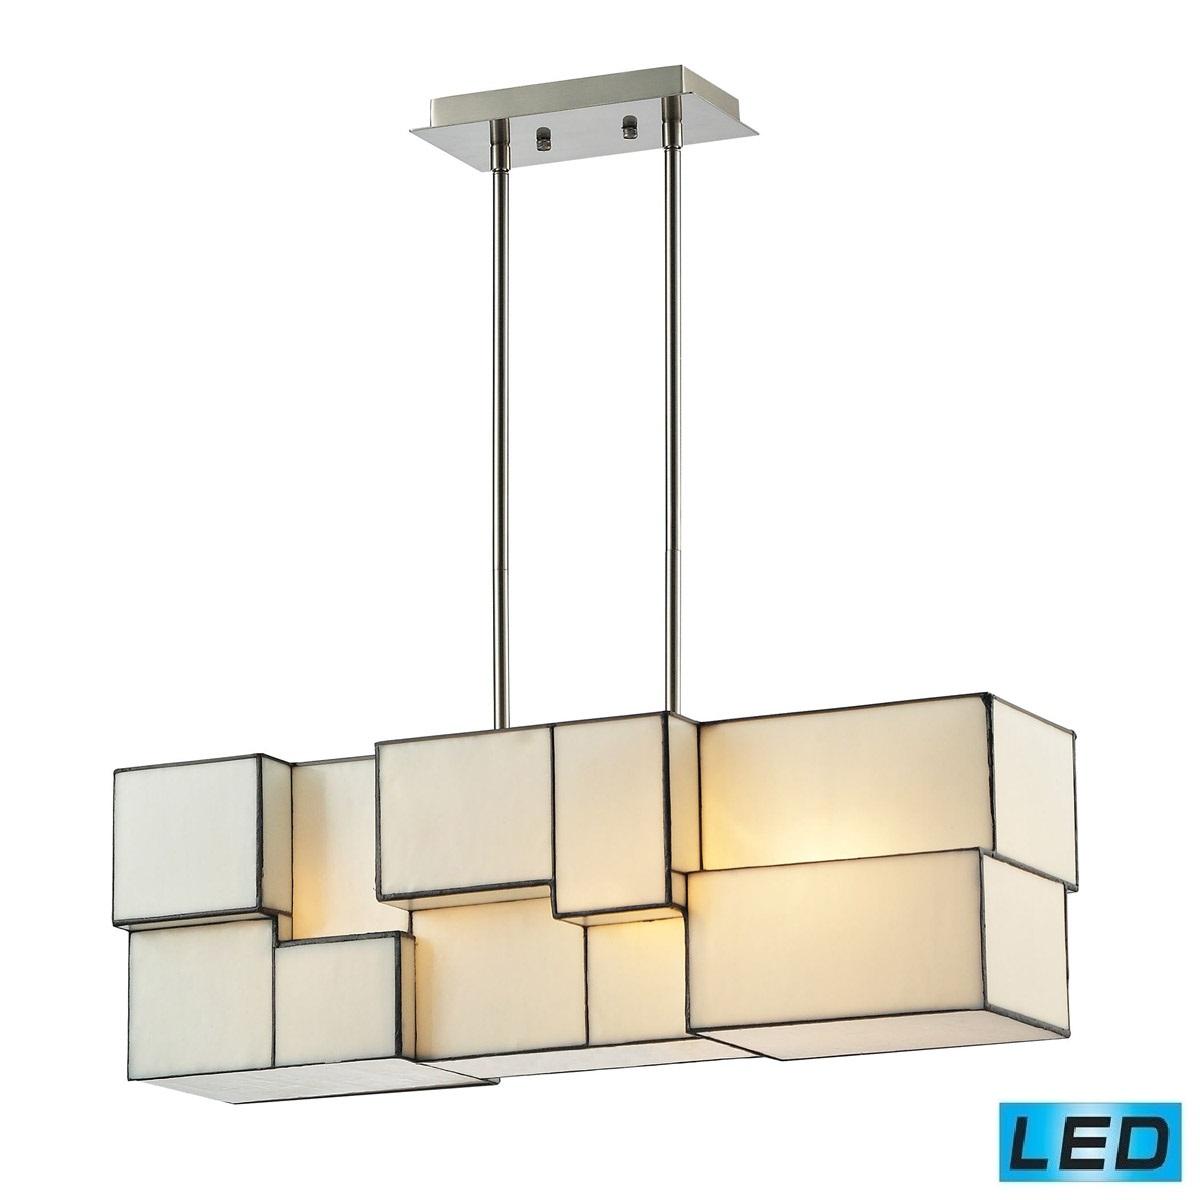 ELK Lighting, Pendant Lights Brooklyn, Furniture by ABD, Accentuations Brand